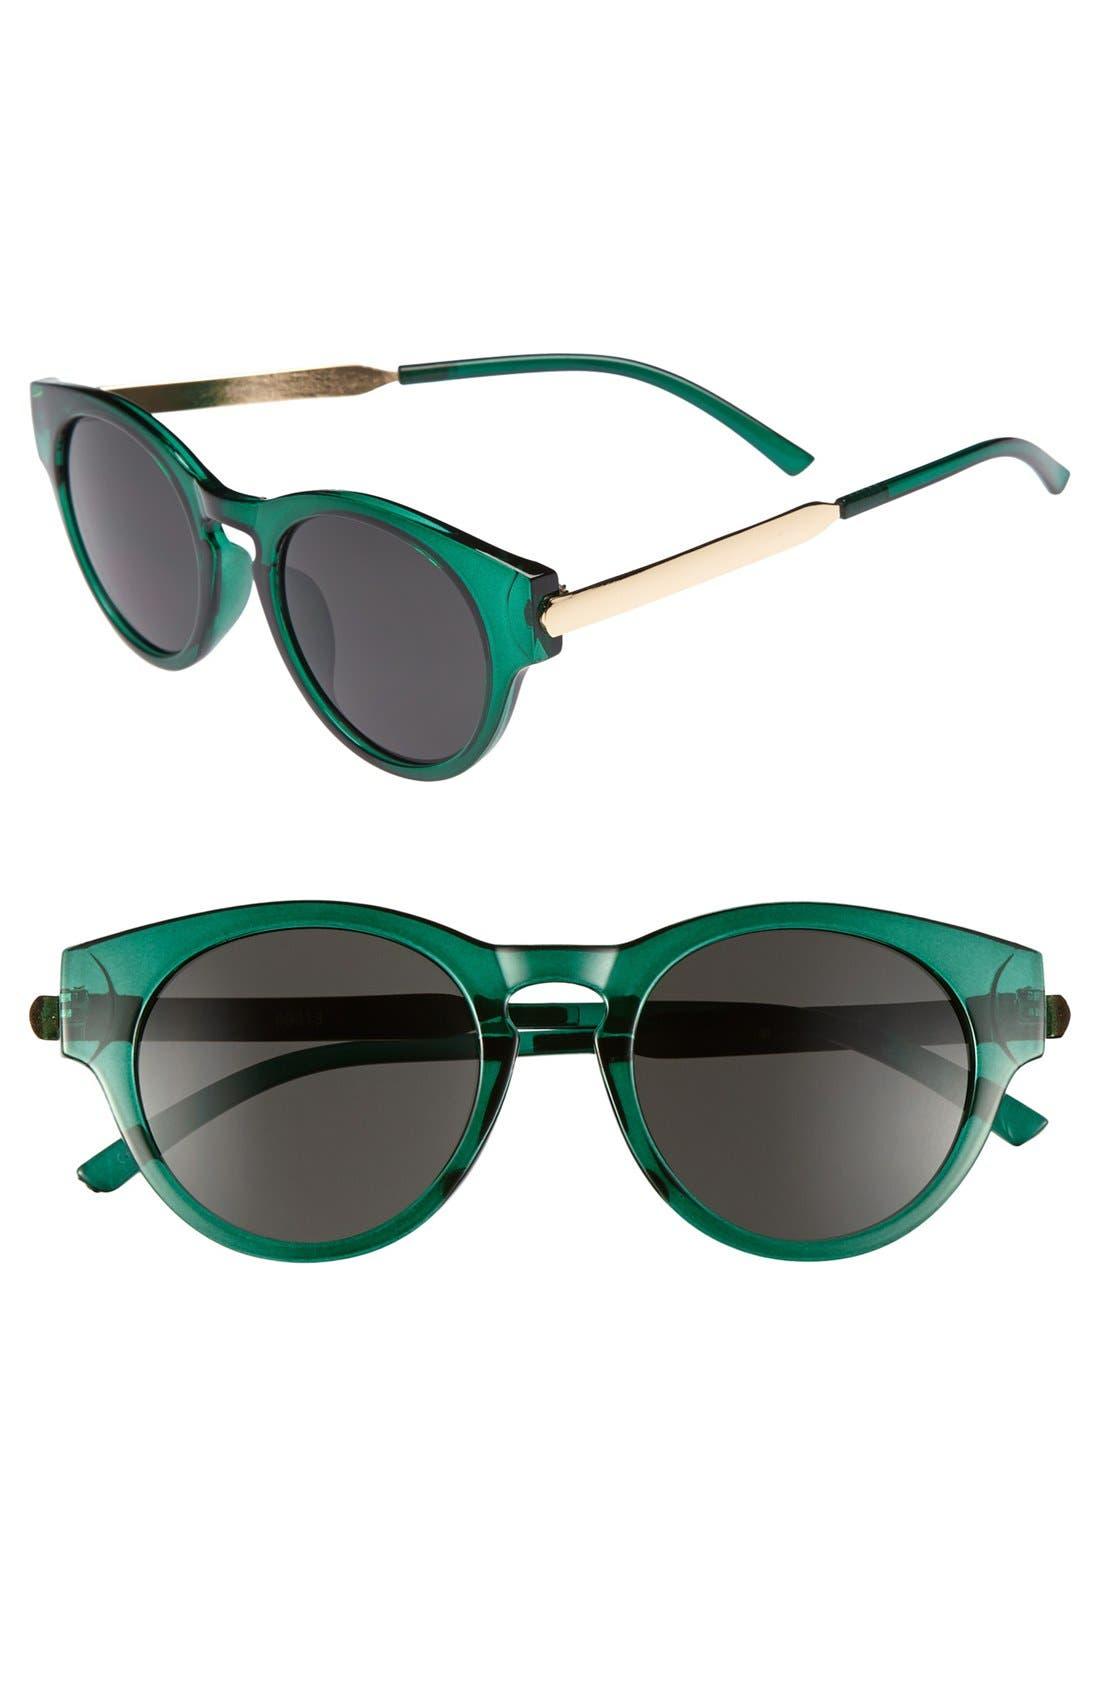 Alternate Image 1 Selected - A.J. Morgan 48mm Retro Sunglasses